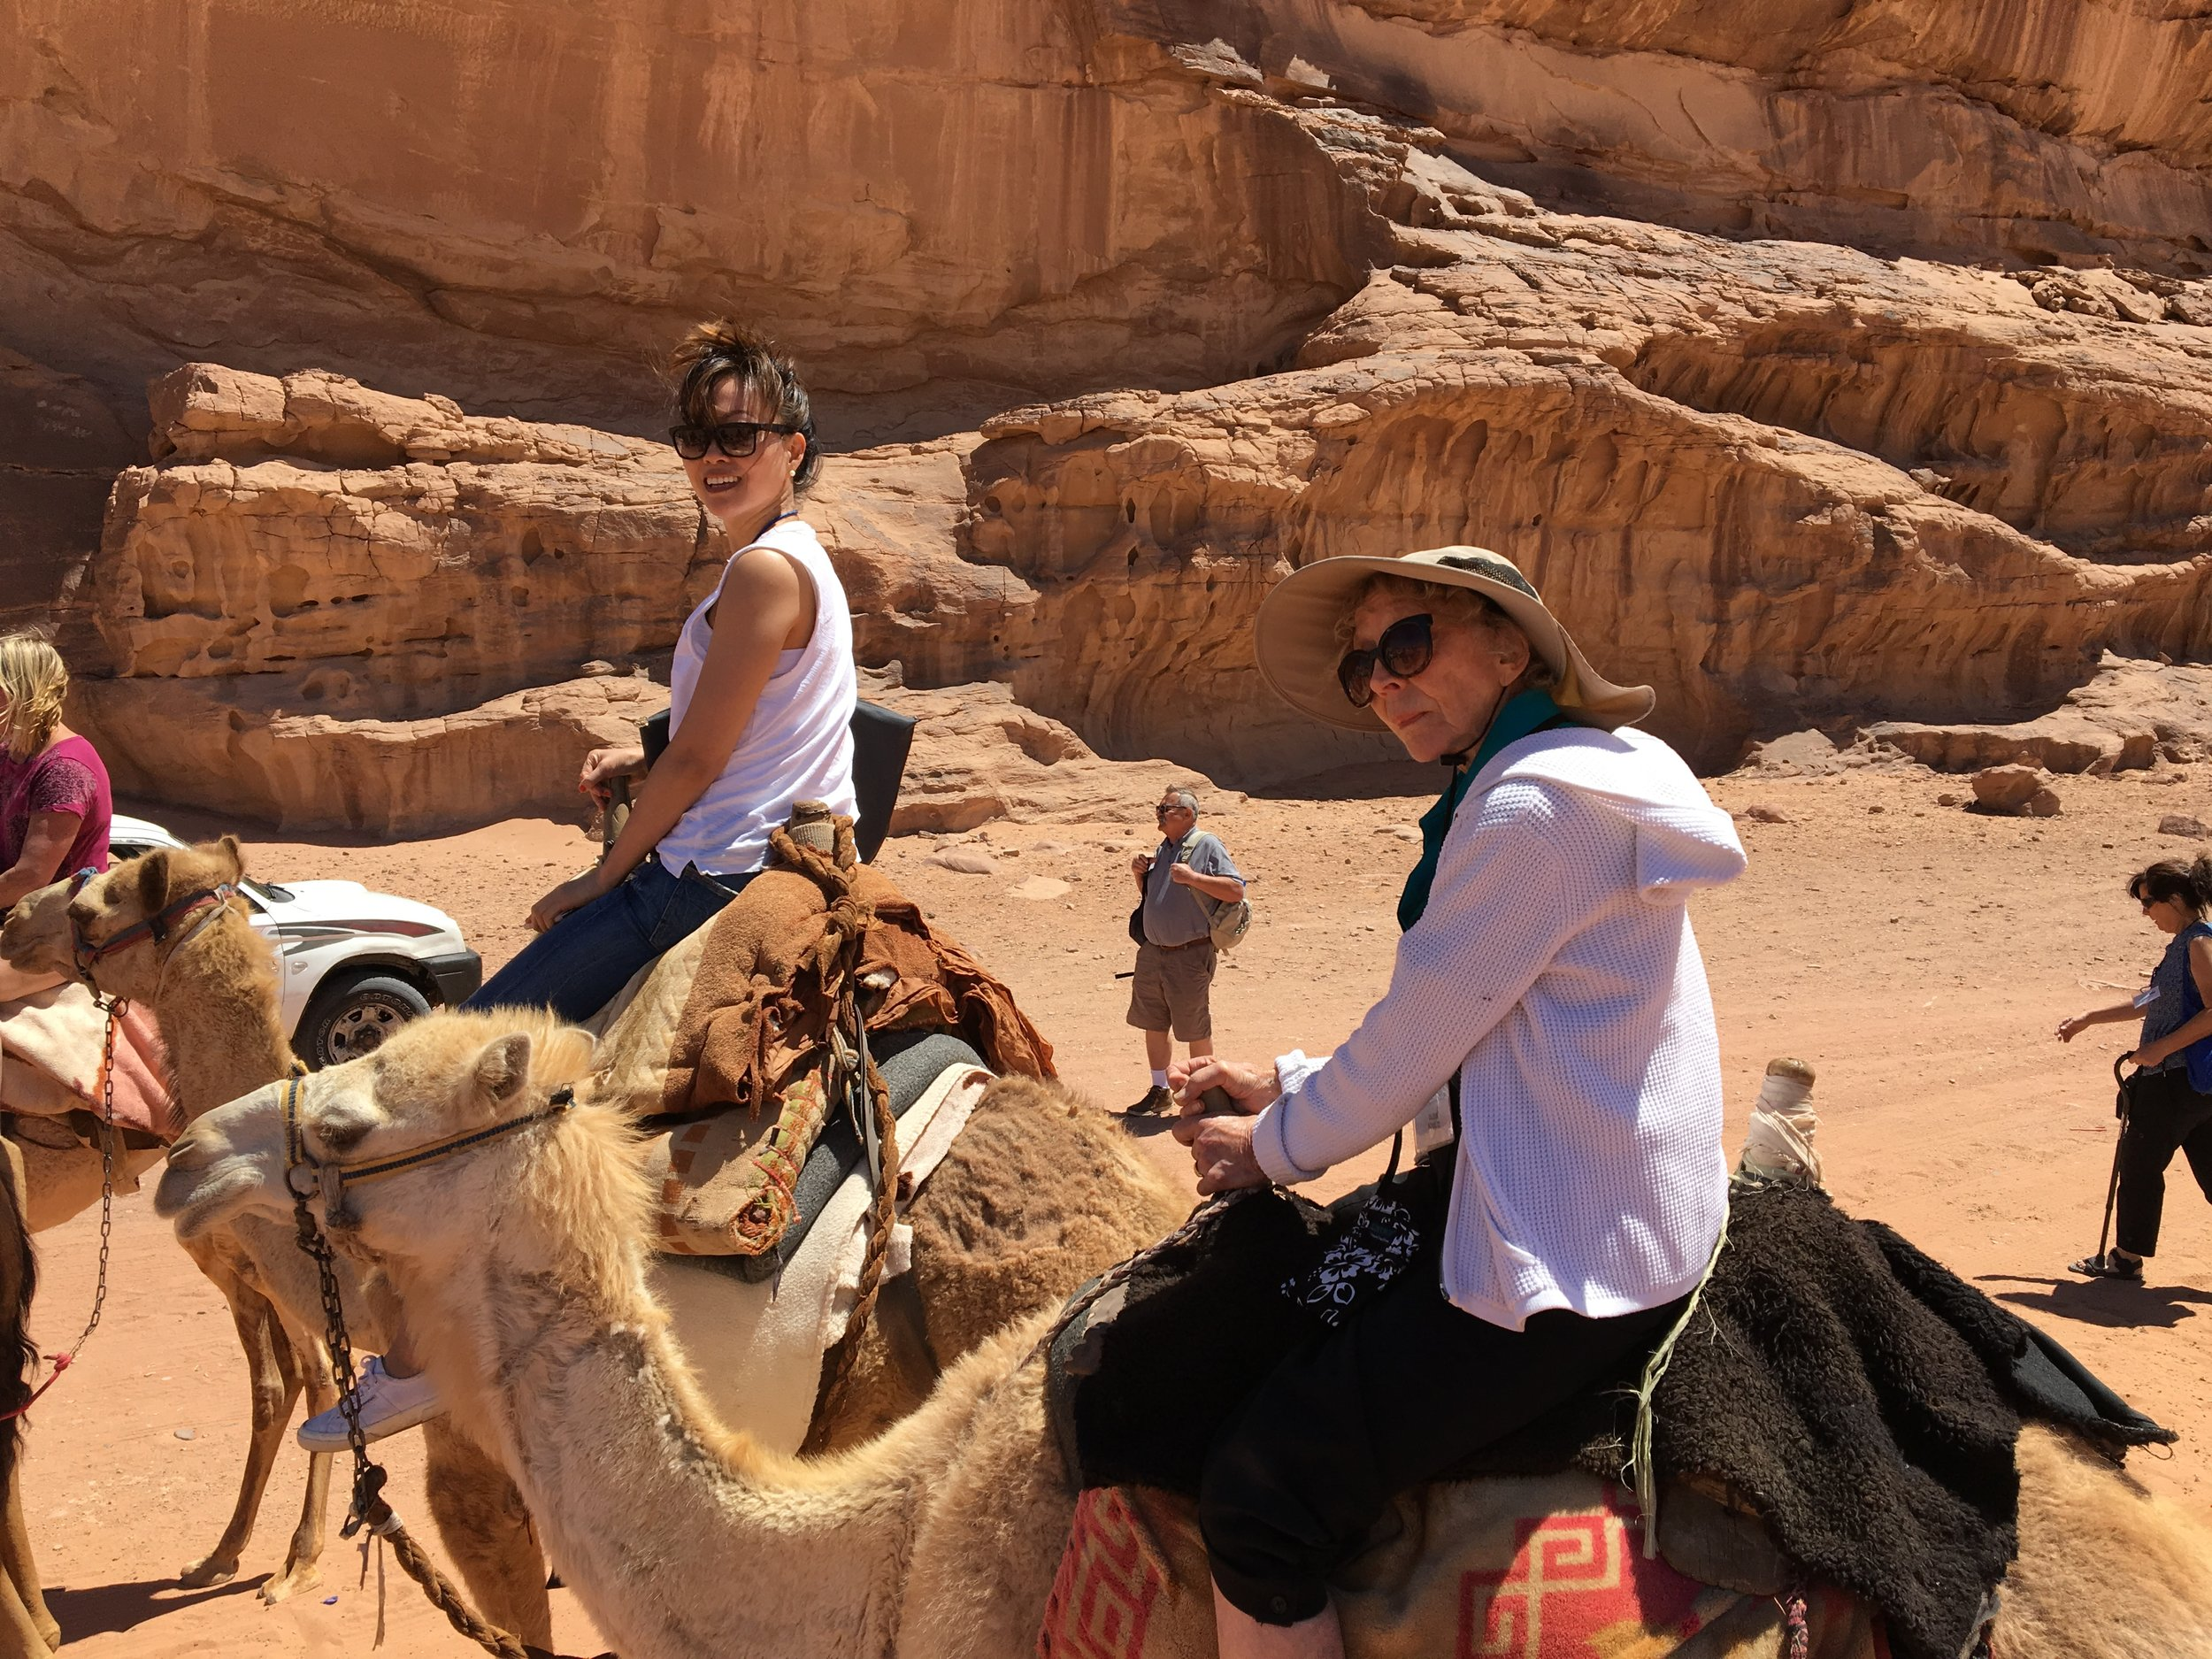 Camel rides in the Jordanian desert